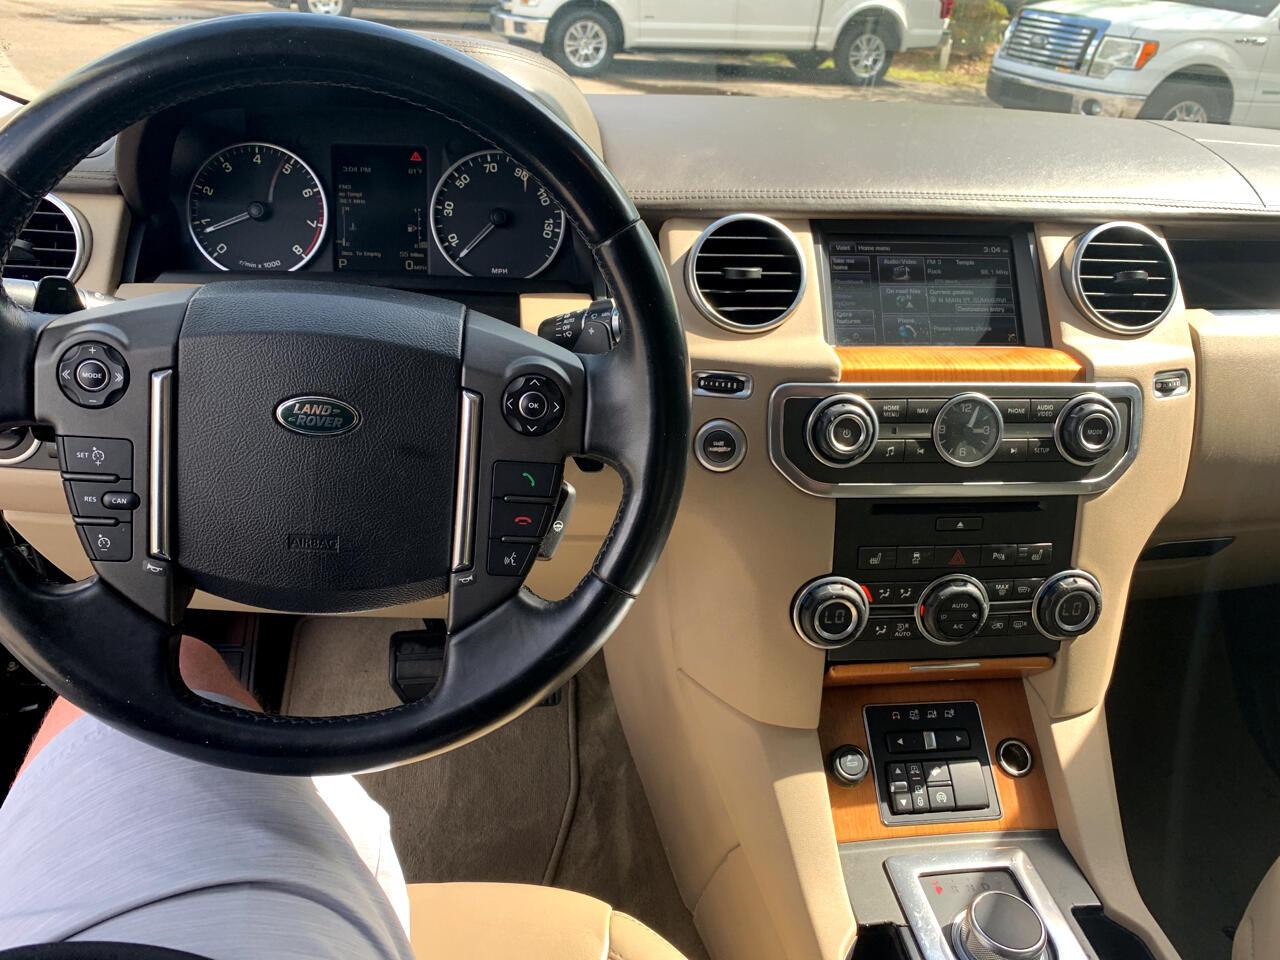 2014 Land Rover LR4 4WD 4dr LUX